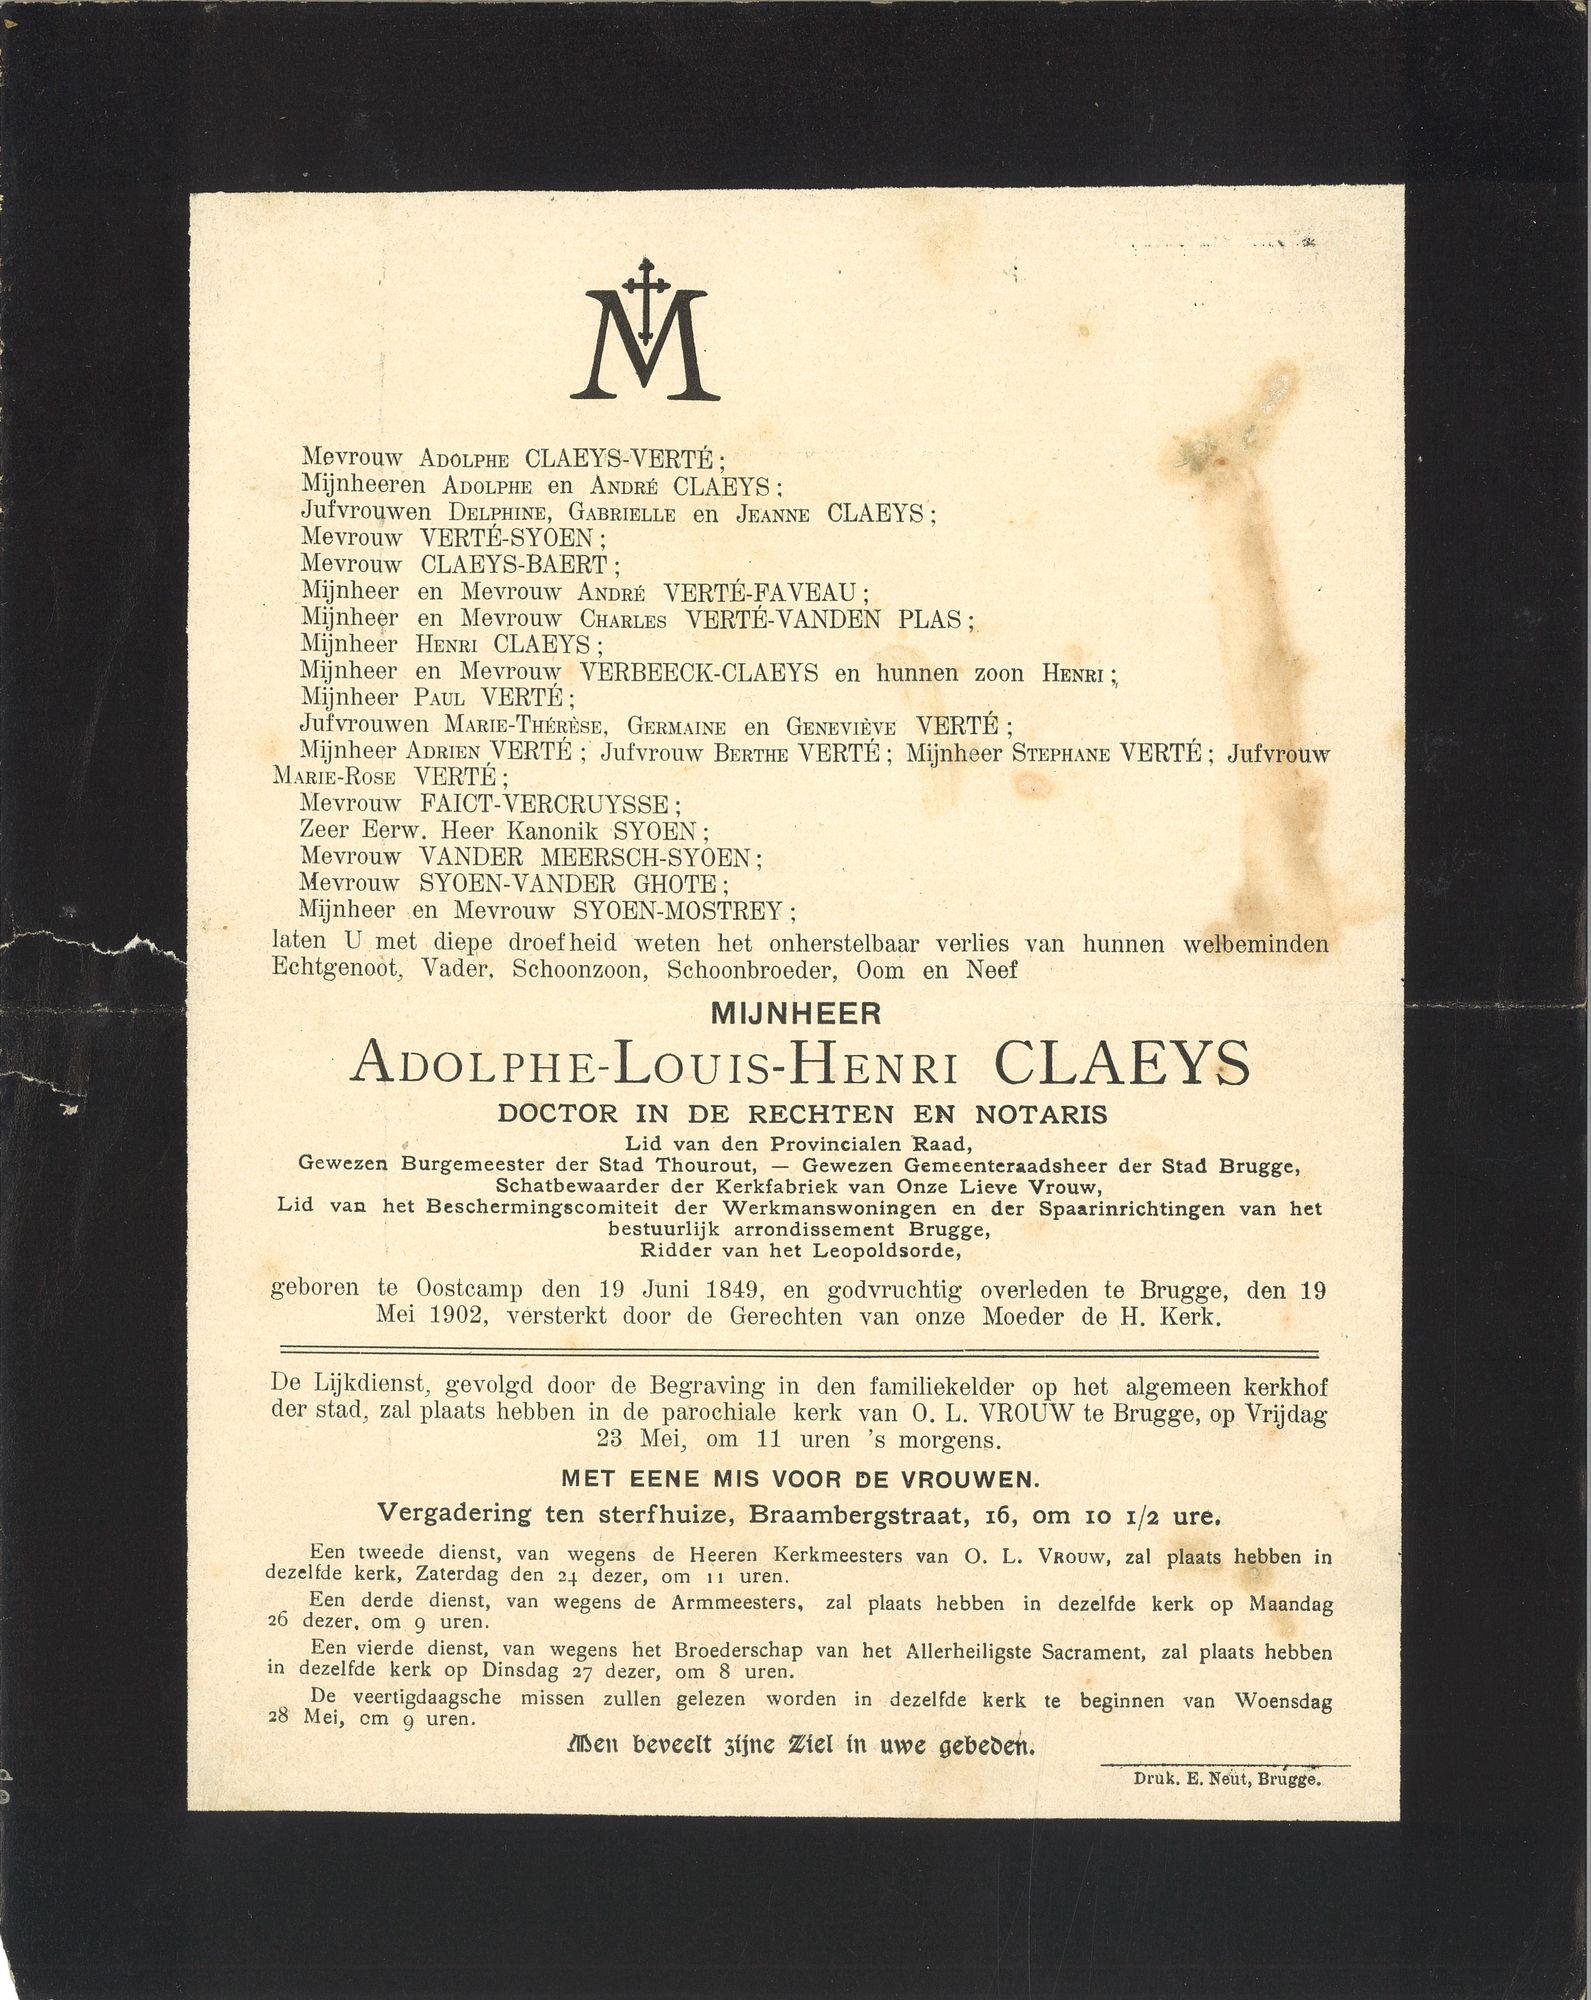 Adolphe-Louis-Henri Claeys